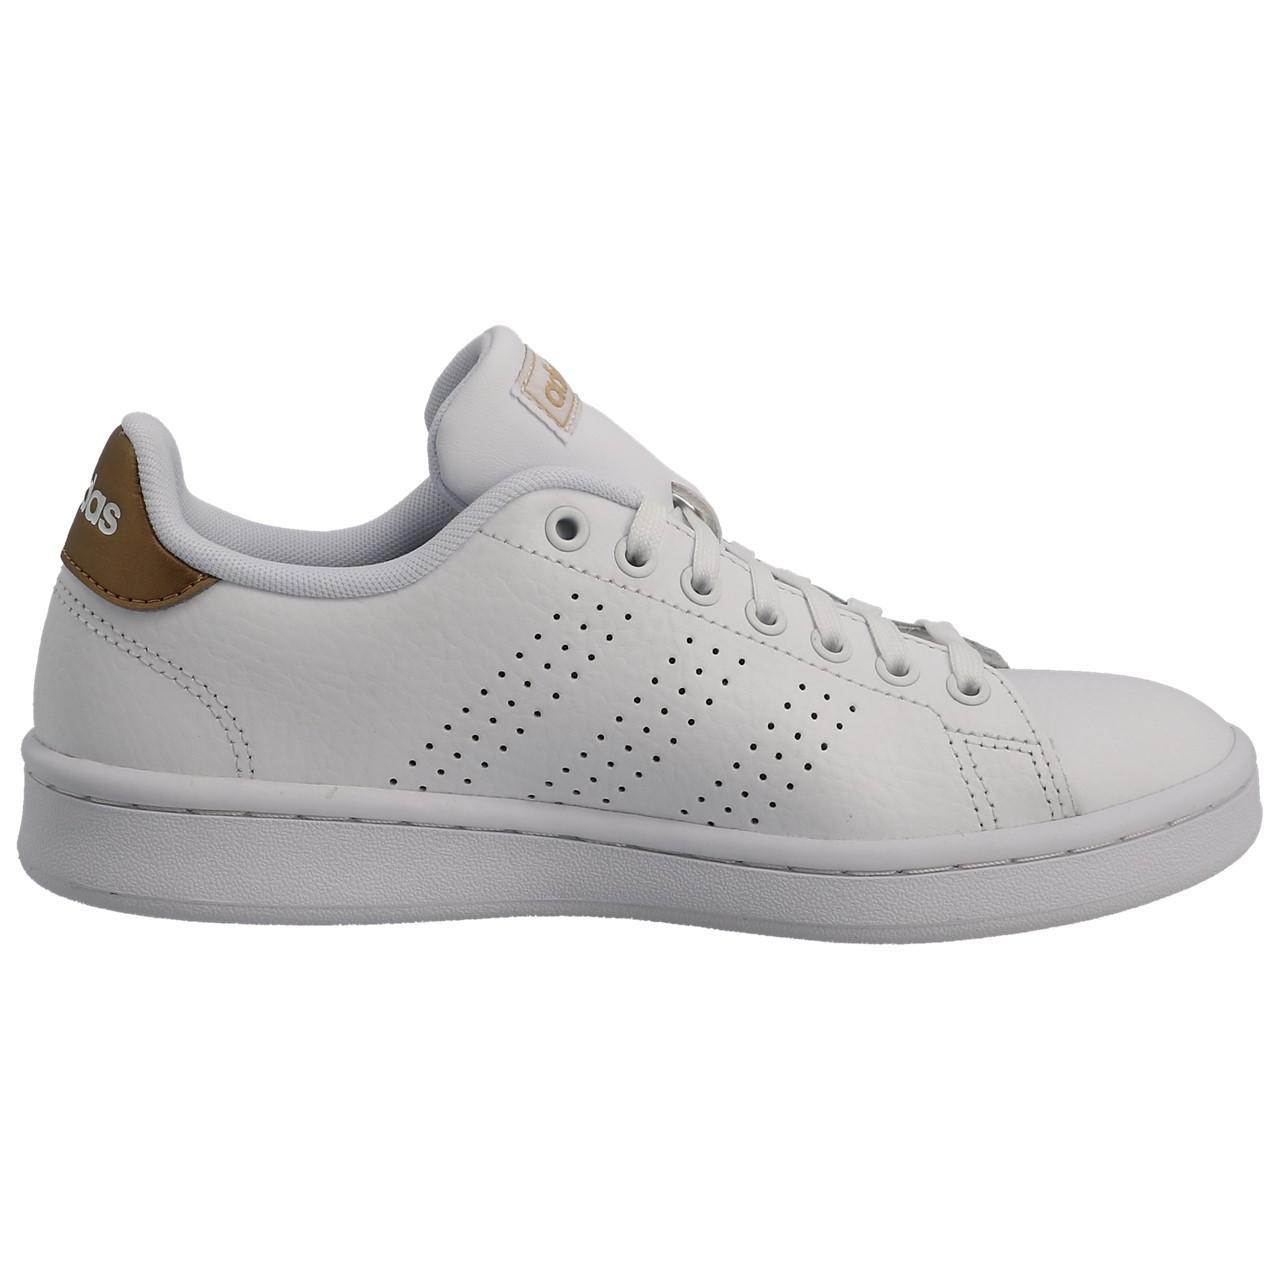 Chaussures mode ville Adidas Advantage w blanc dore Blanc